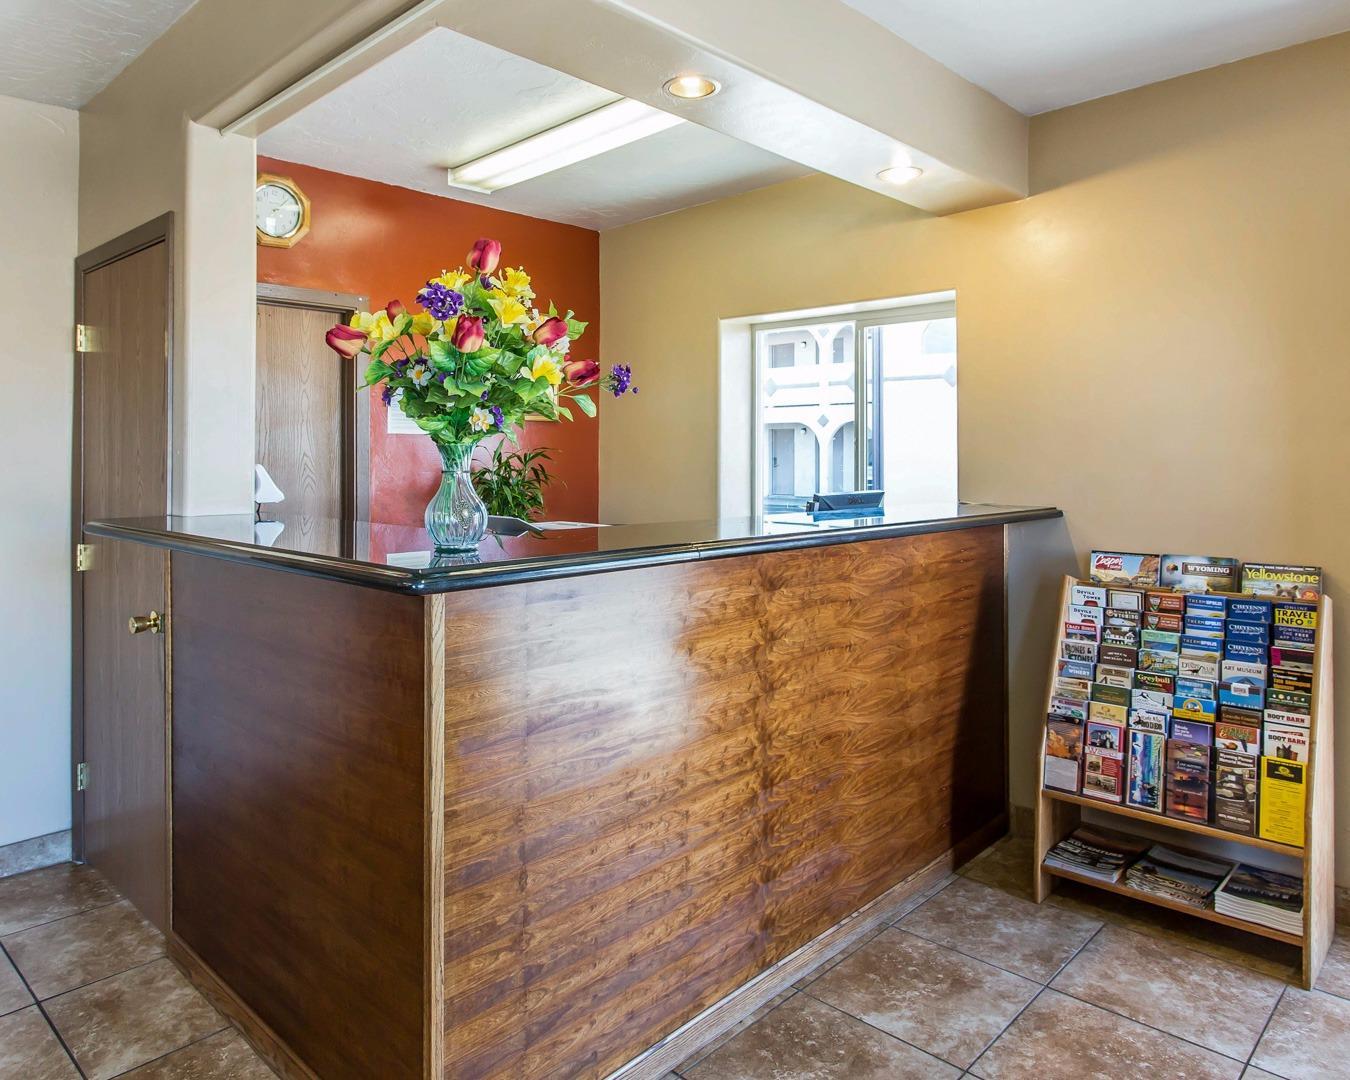 Rodeway Inn & Suites, Riverton WY